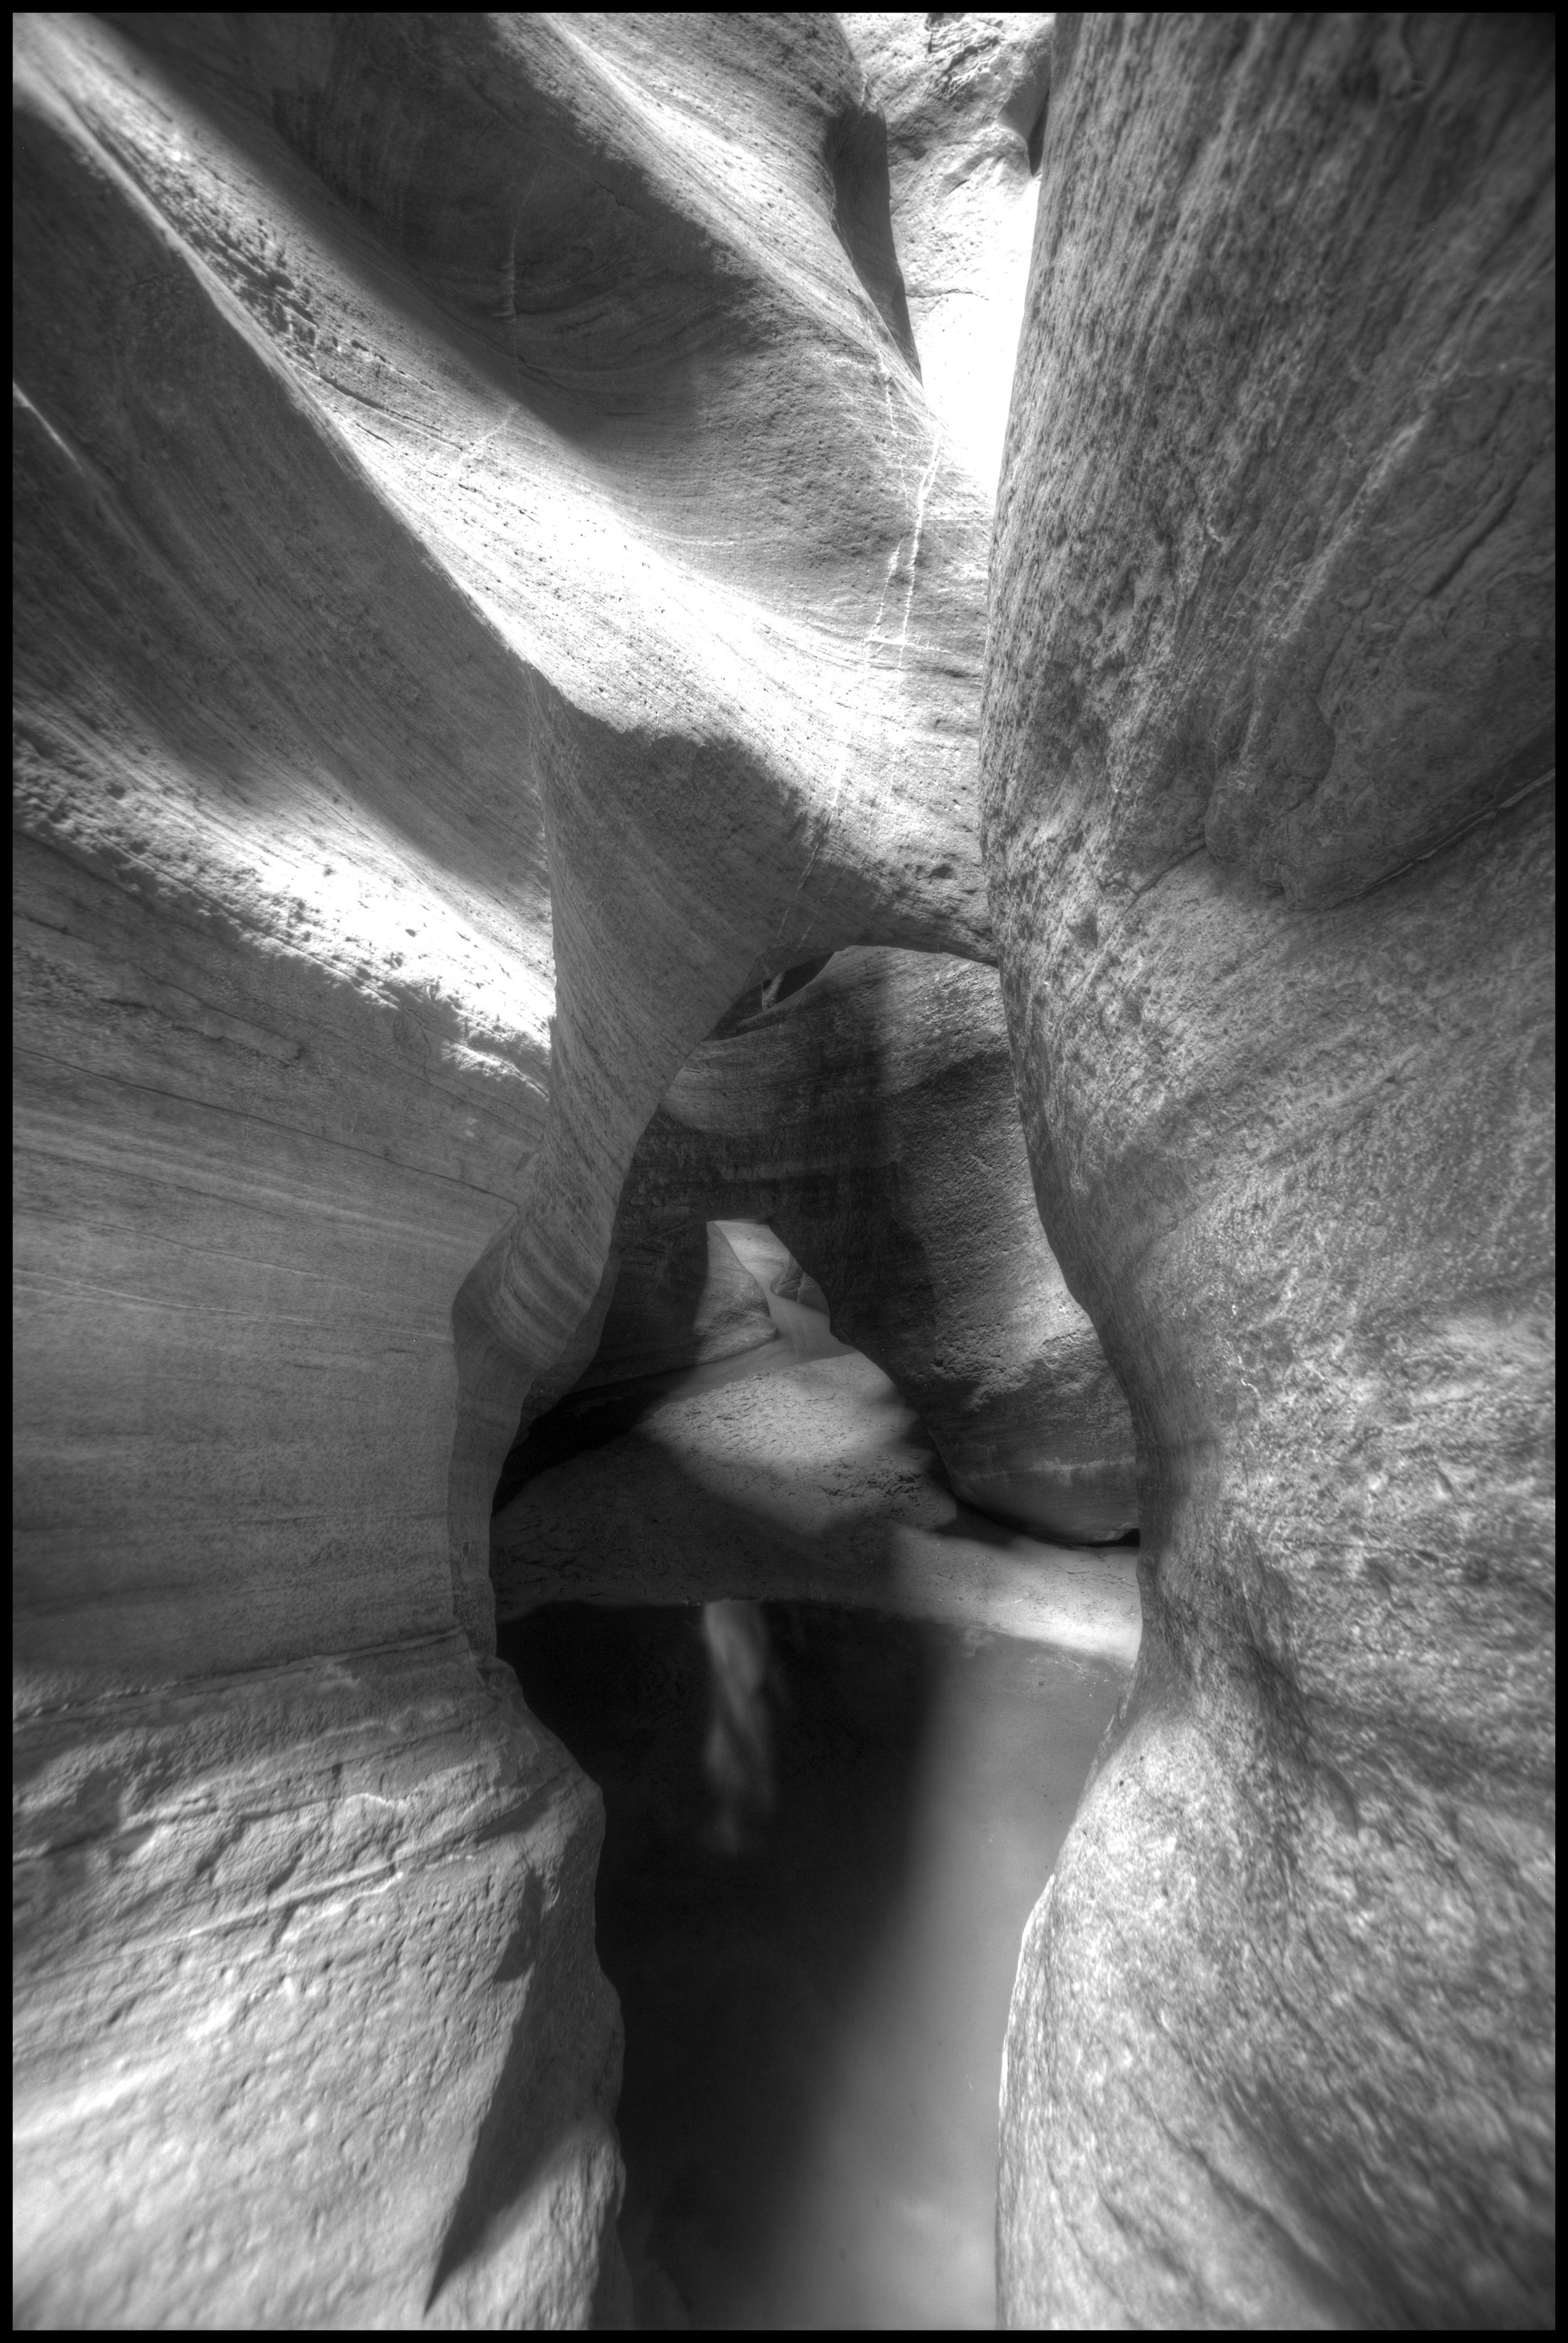 Fat Man's Misery, Zion National Park, UT